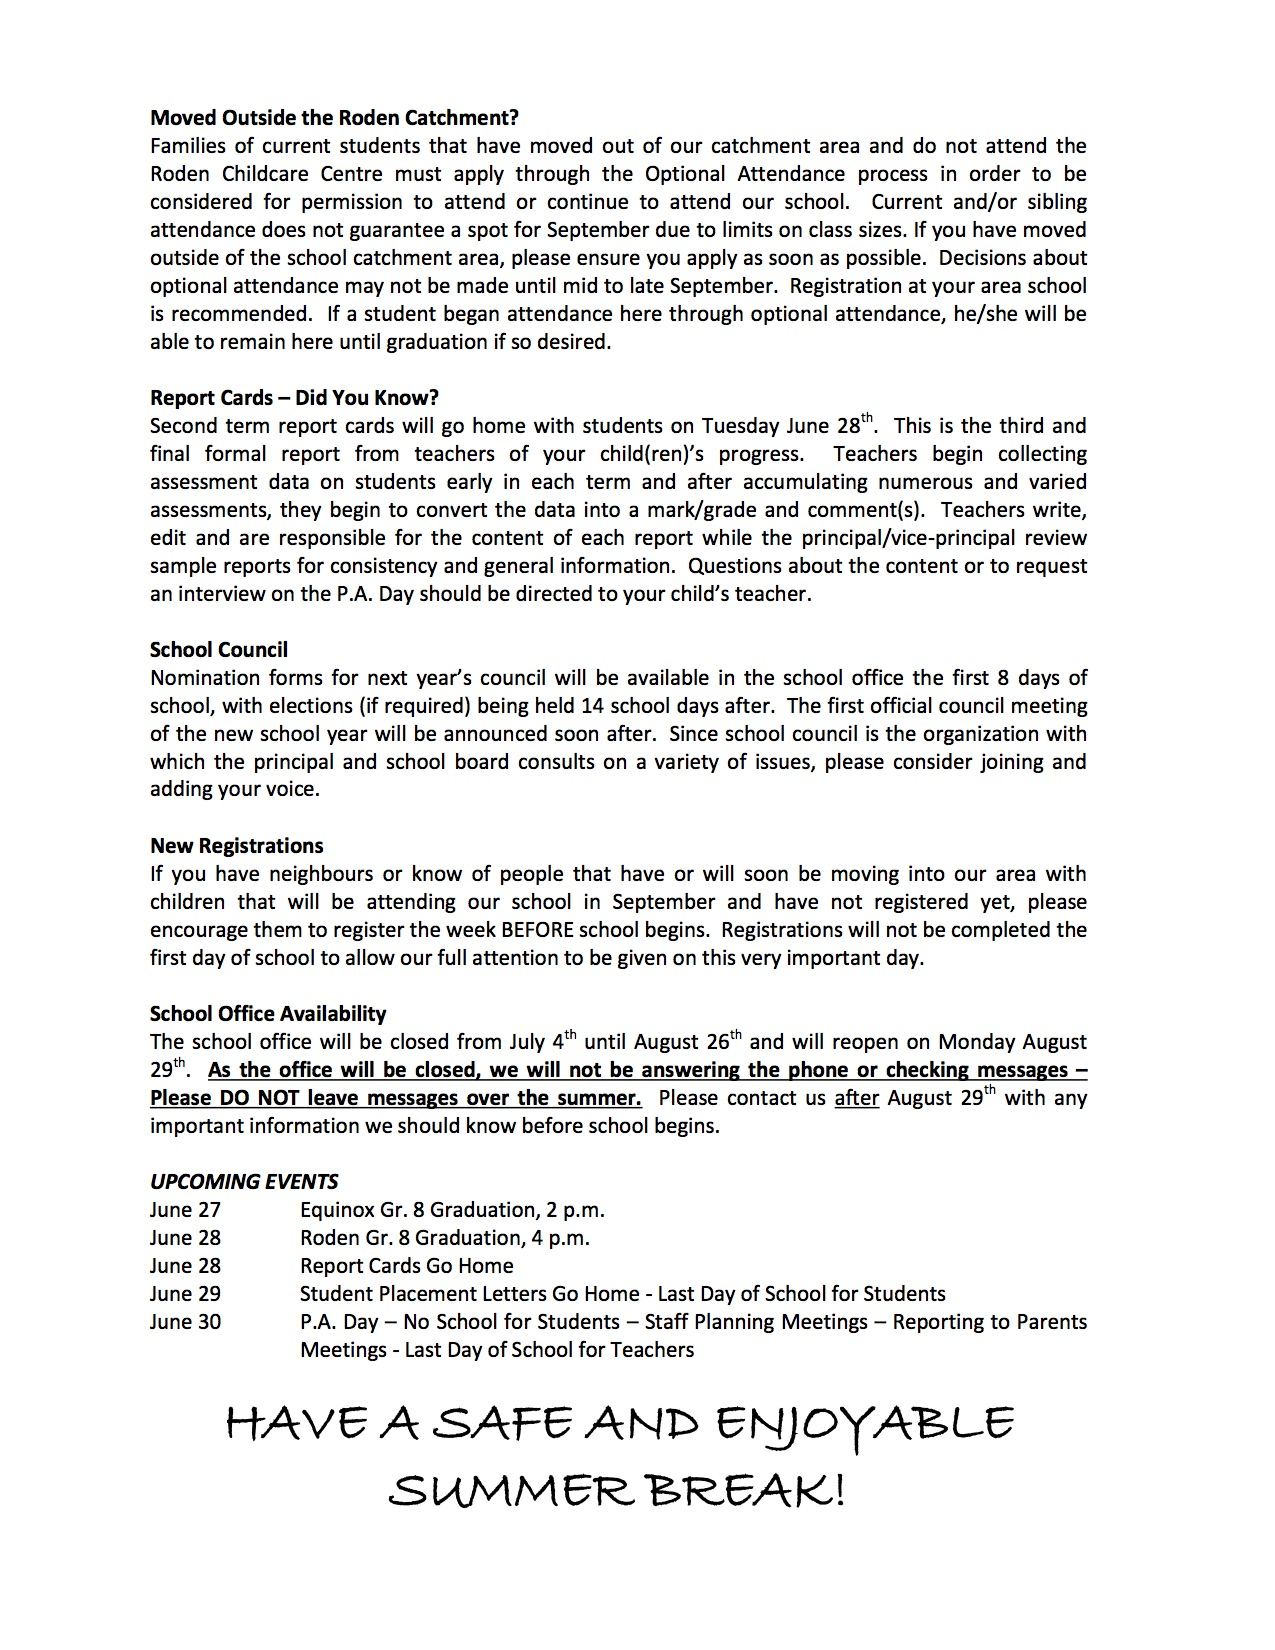 Roden Newsletter 16-06-24p2